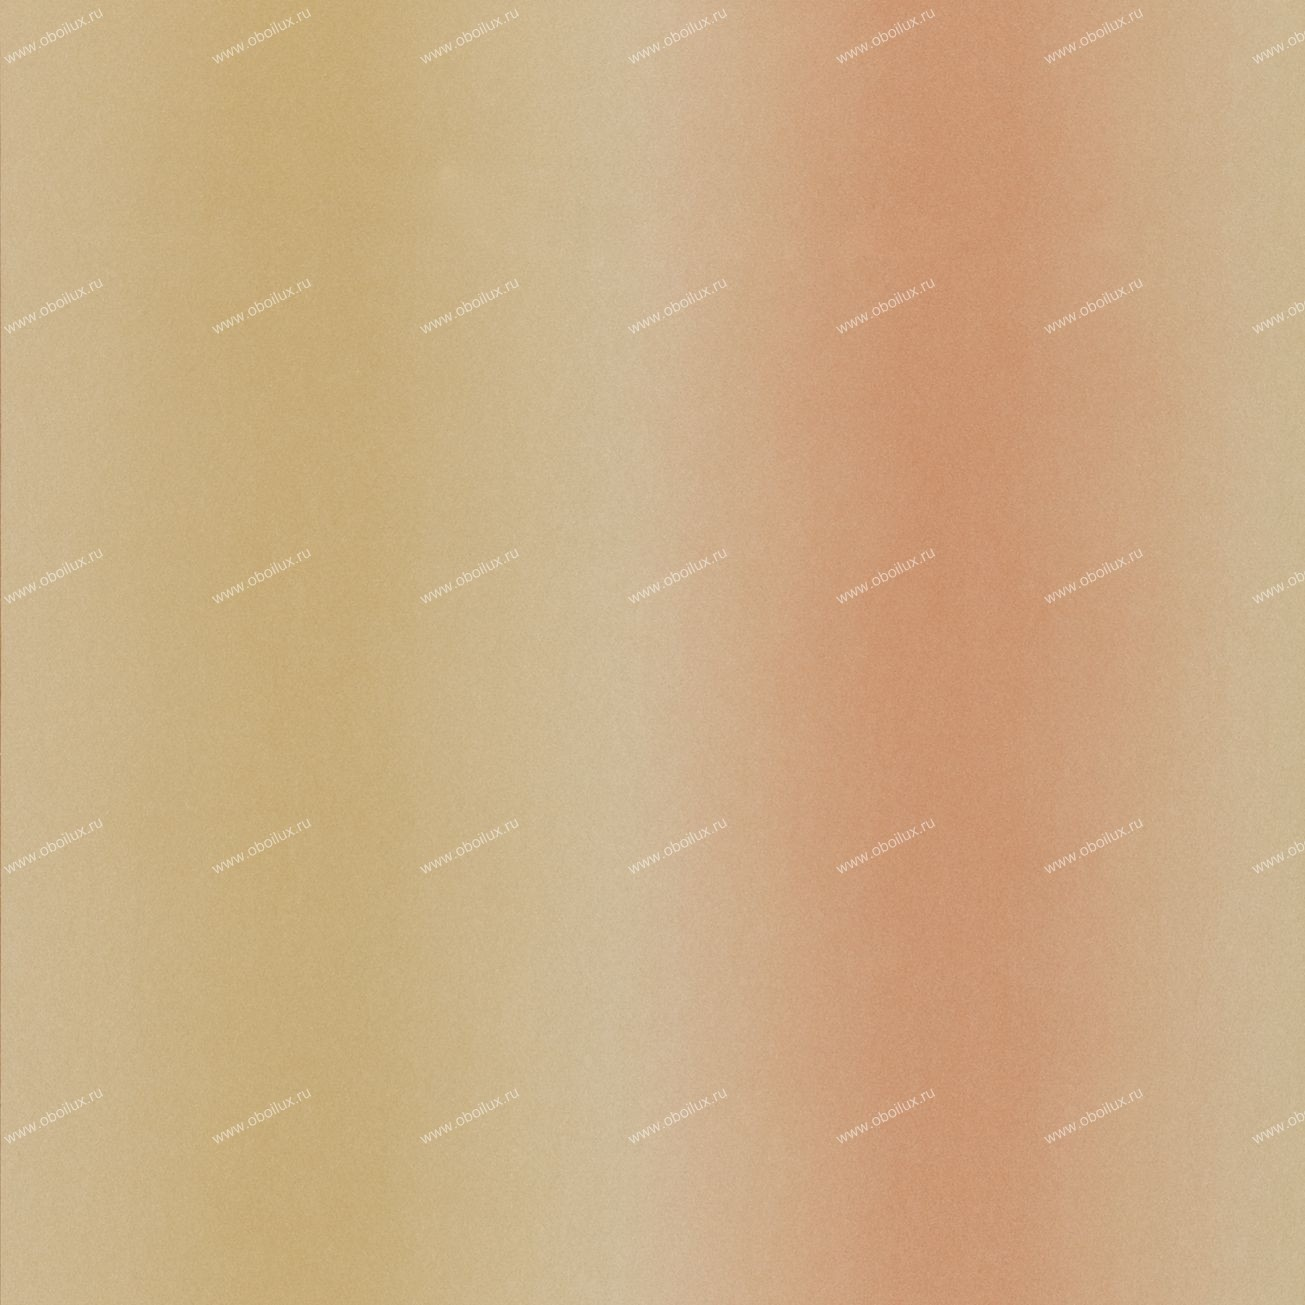 Английские обои Sanderson,  коллекция Colour for Living, артикул211678